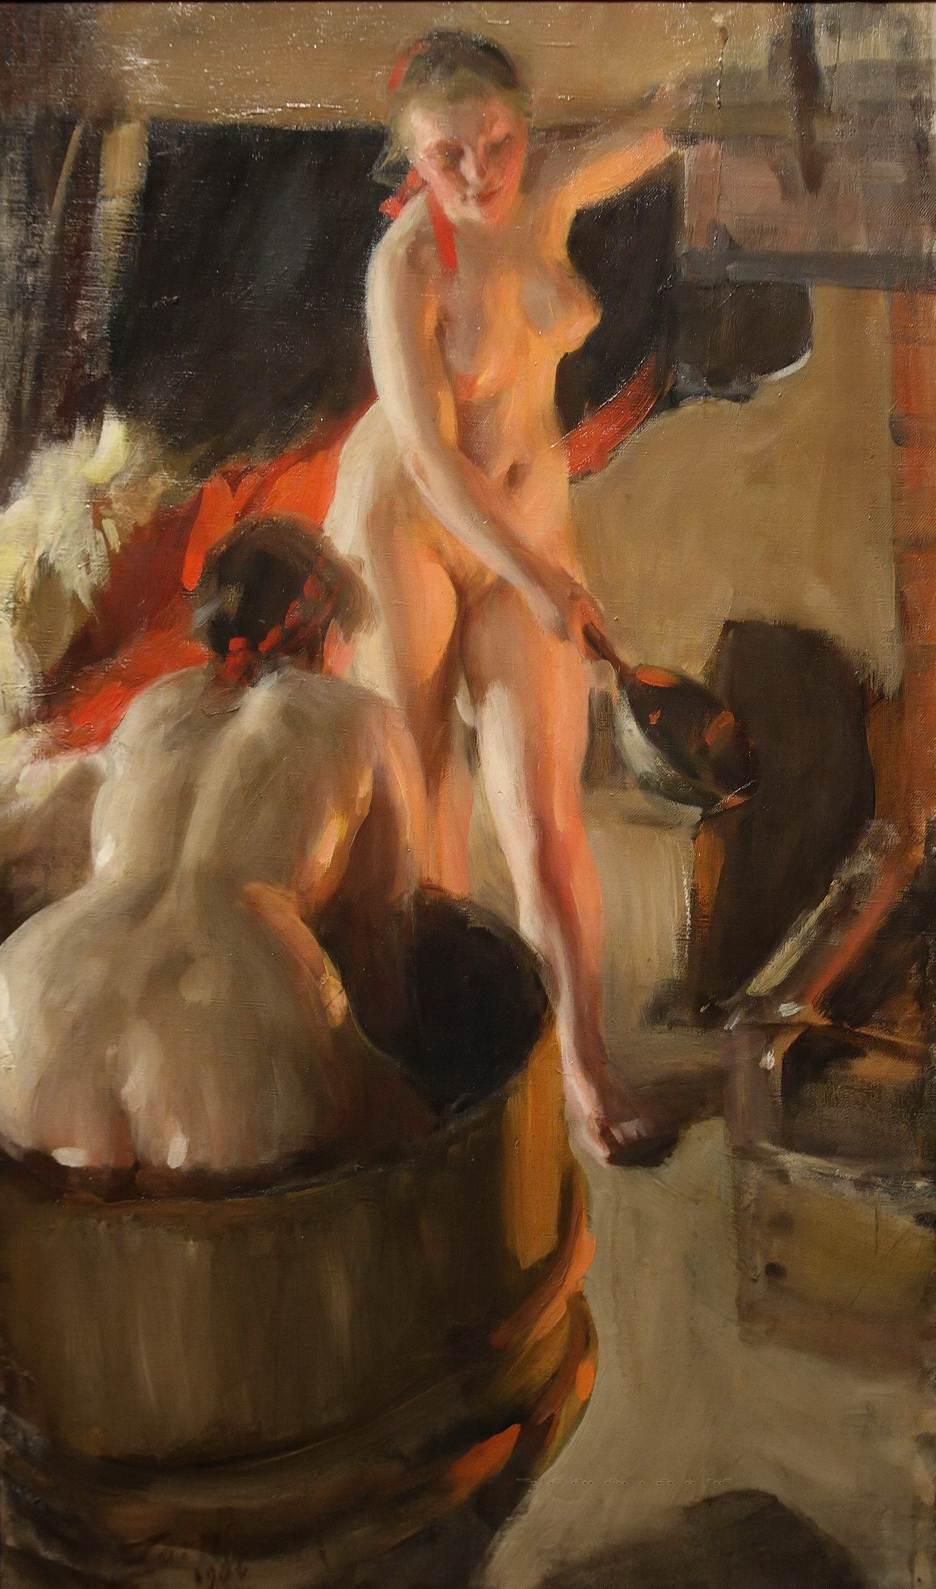 Anders Leonard Zorn. 1860-1920. Женщины в сауне. 86 х 53 см. Мура, Музей Цорна